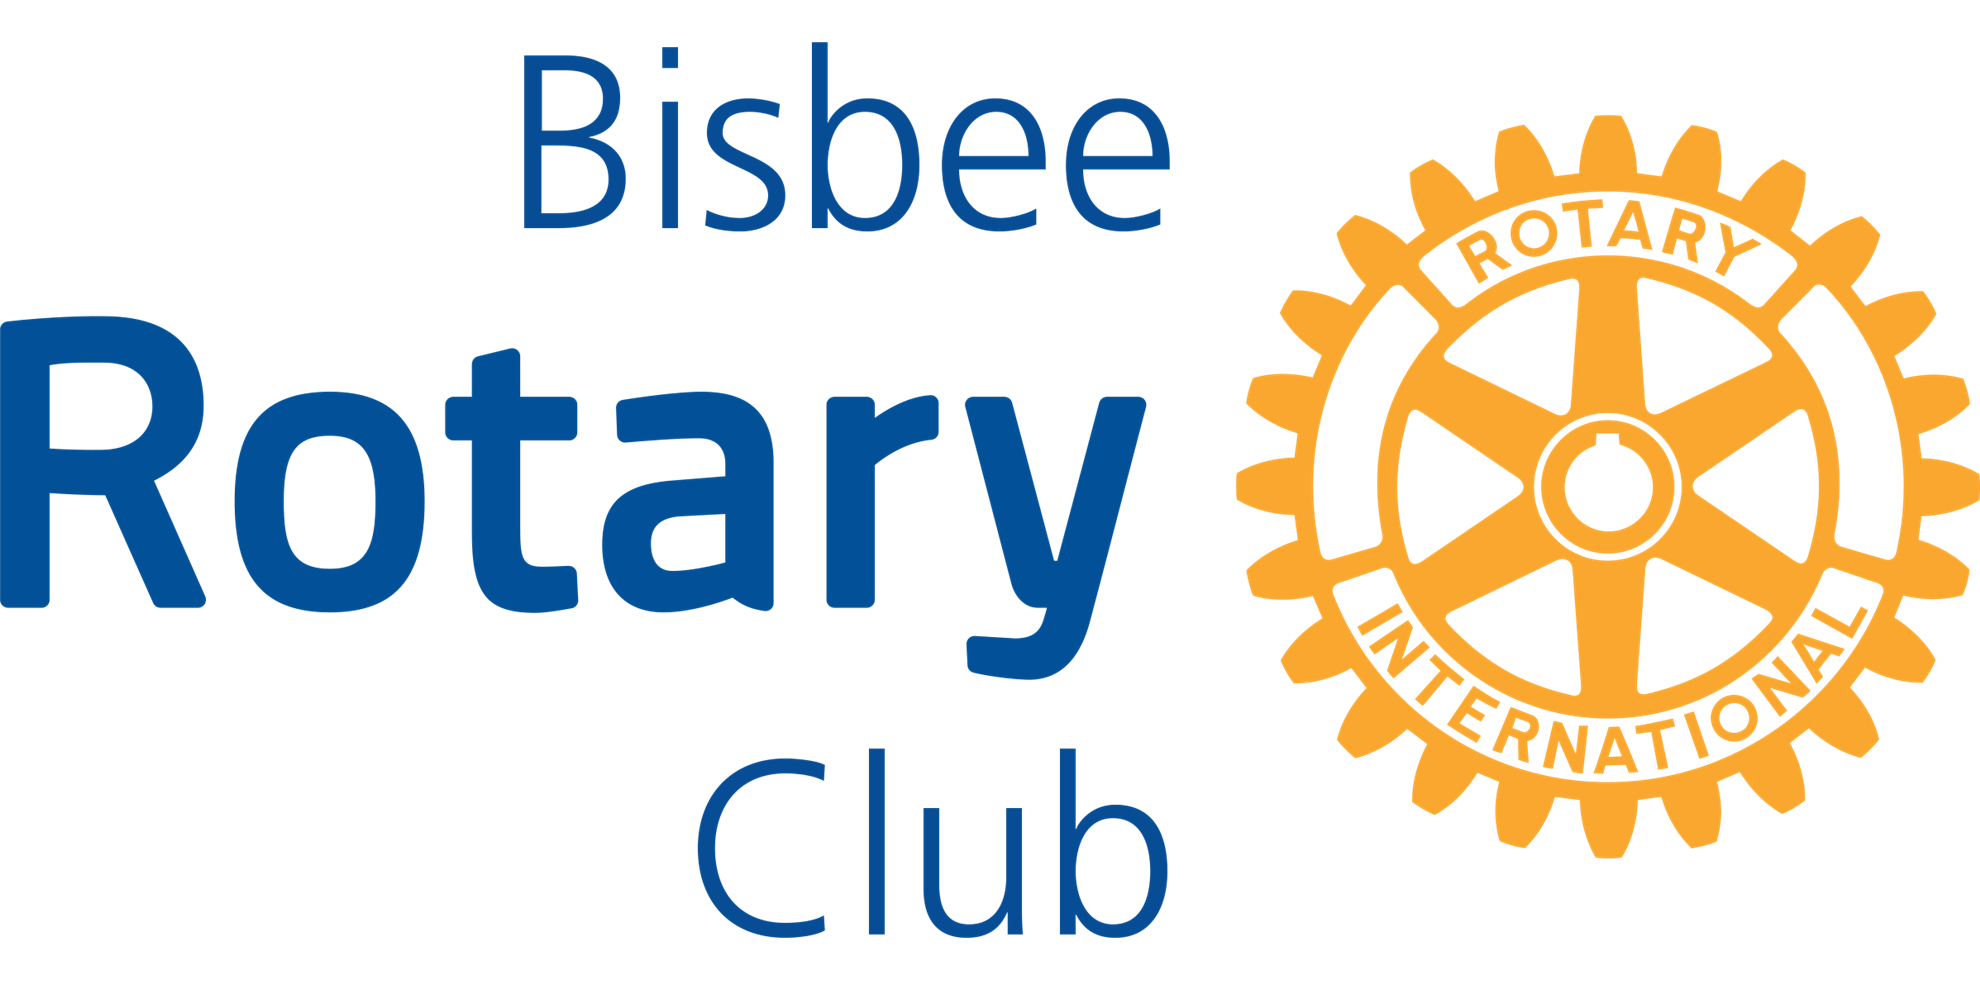 Bisbee logo